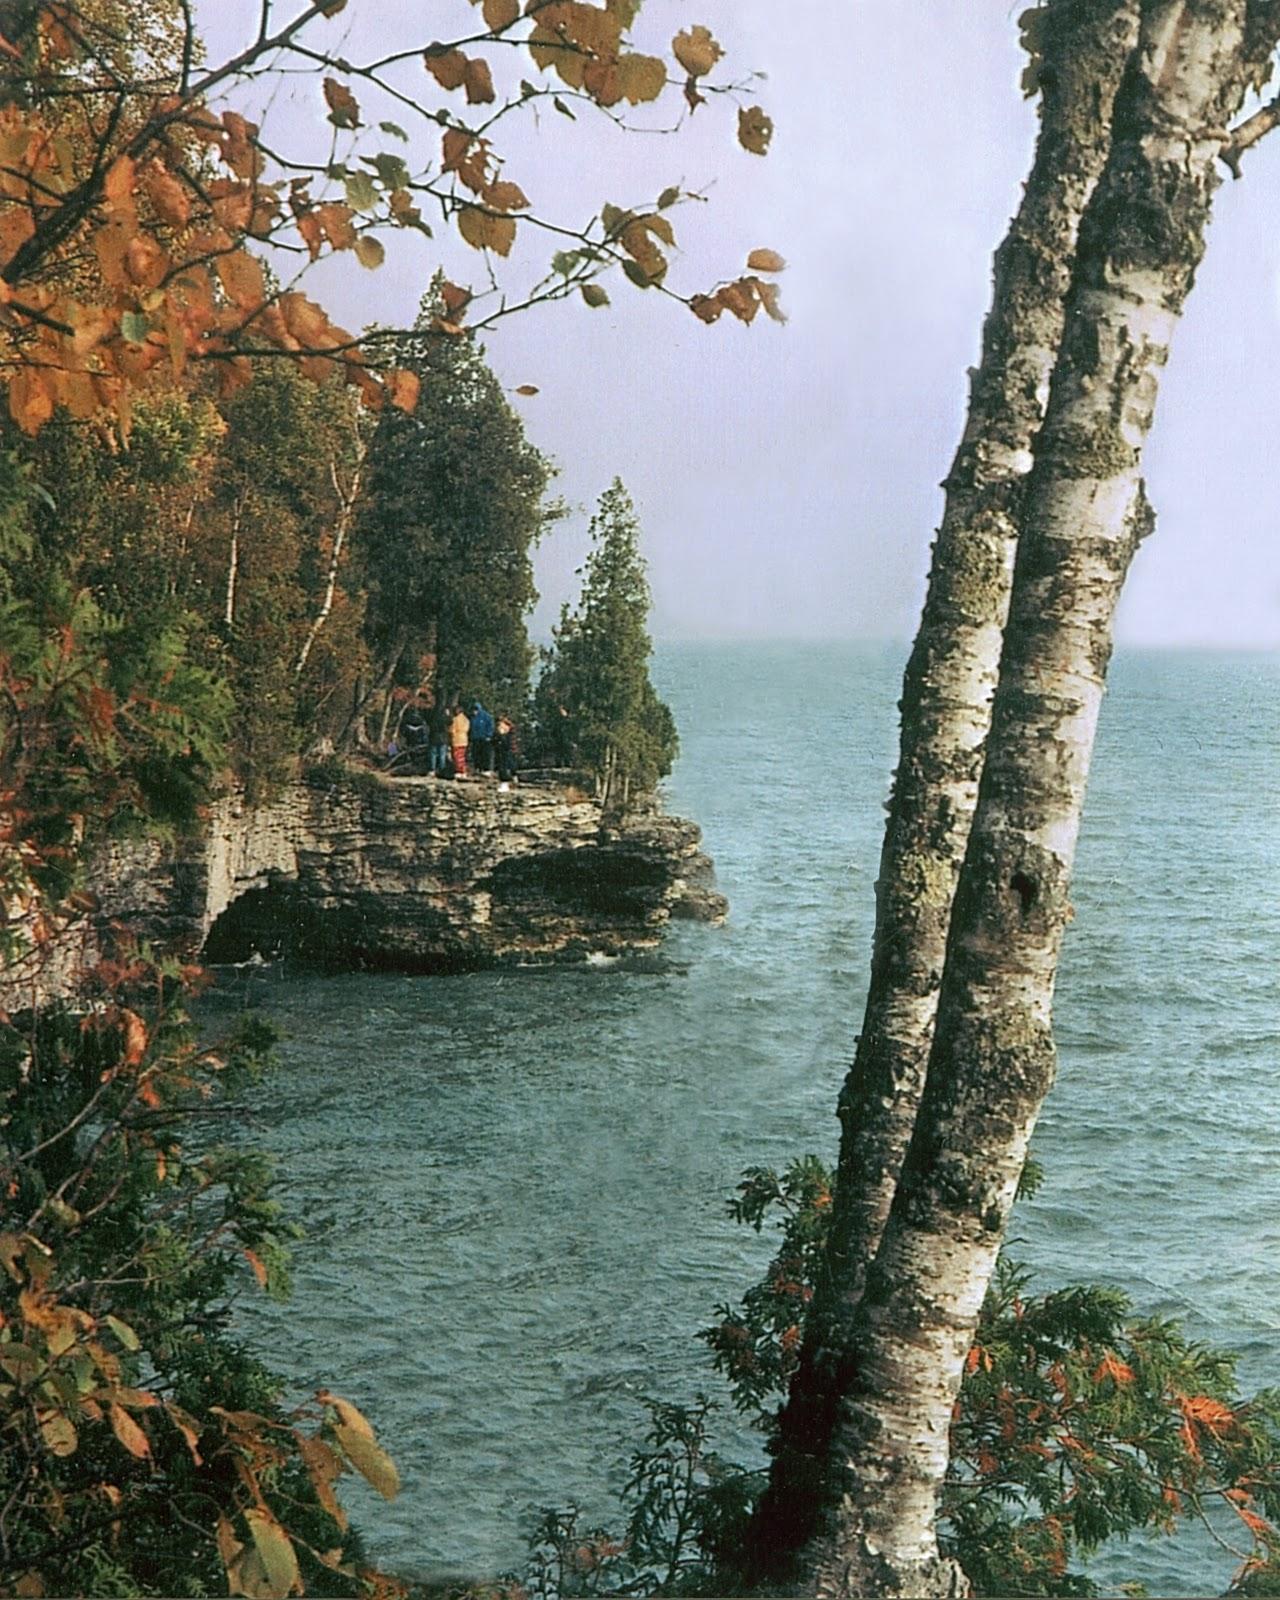 Lake Superior: CLARK'S TALES: MAGNIFICENT LAKE SUPERIOR